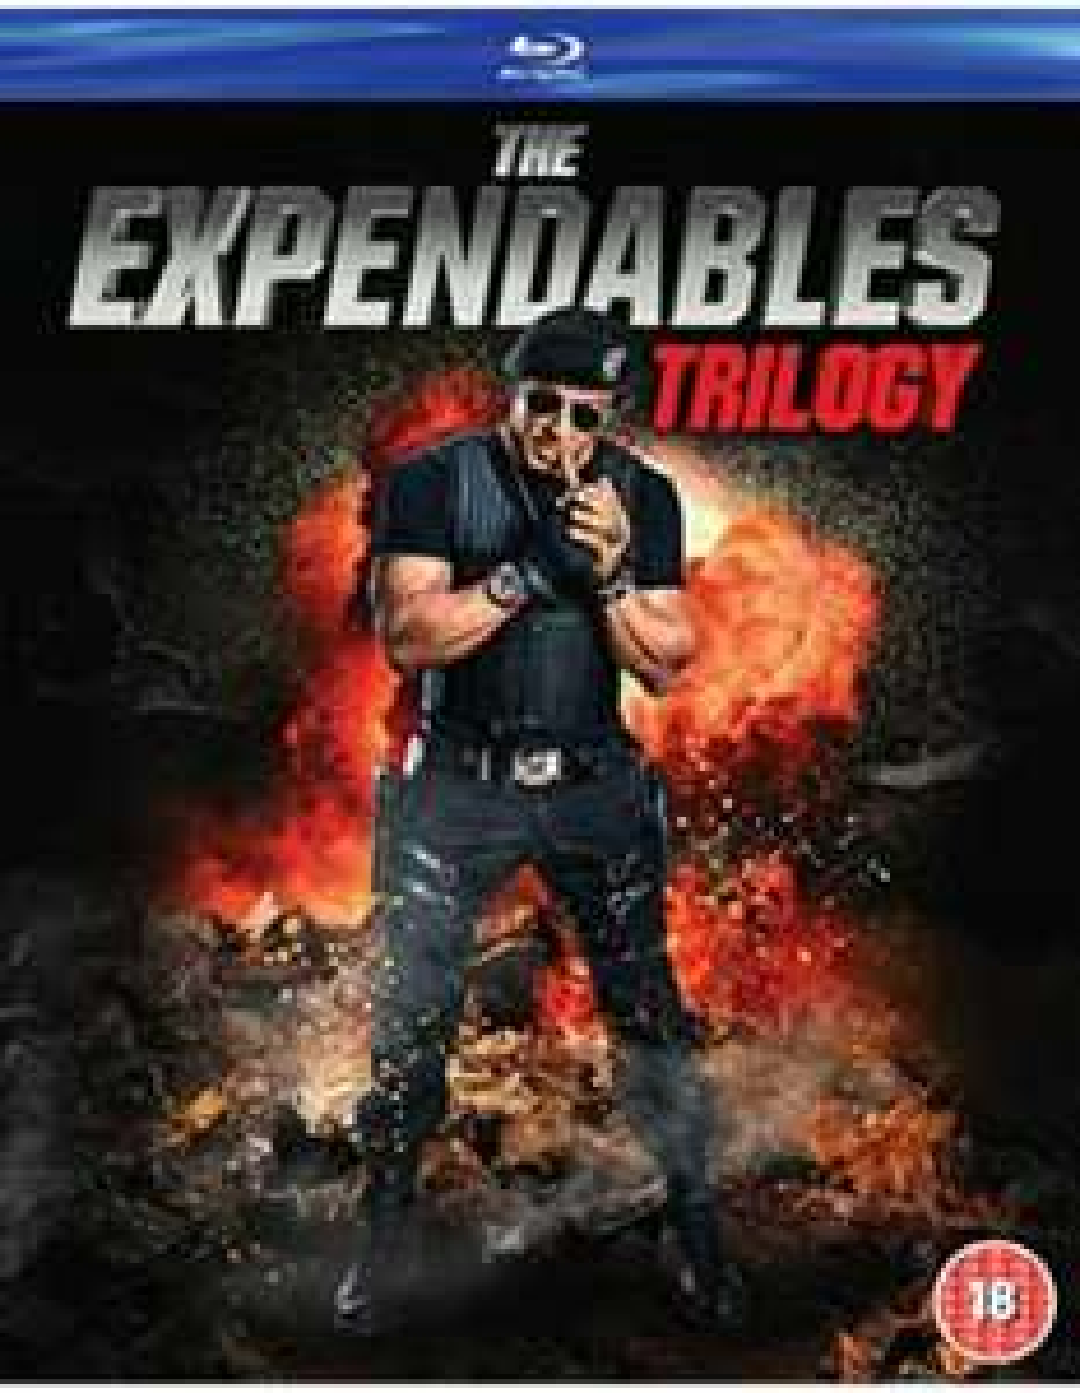 The Expendables Trilogy Blu-ray Box Set (Amazon Prime Exclusive) - £5.95 @ Amazon